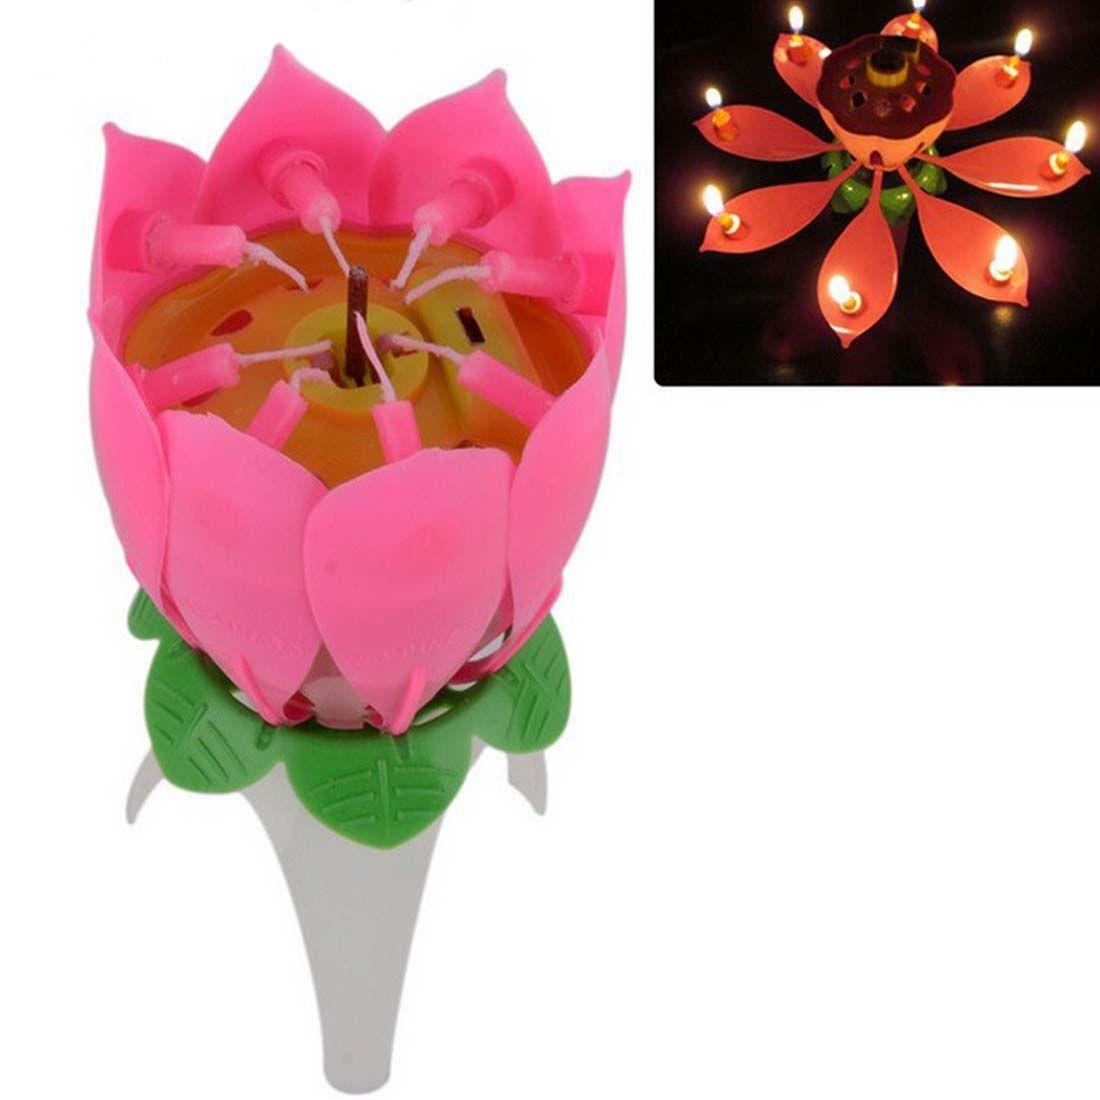 Non Smoky Safty Sparkling Flower Candle 8 Wicks Musical Lotus